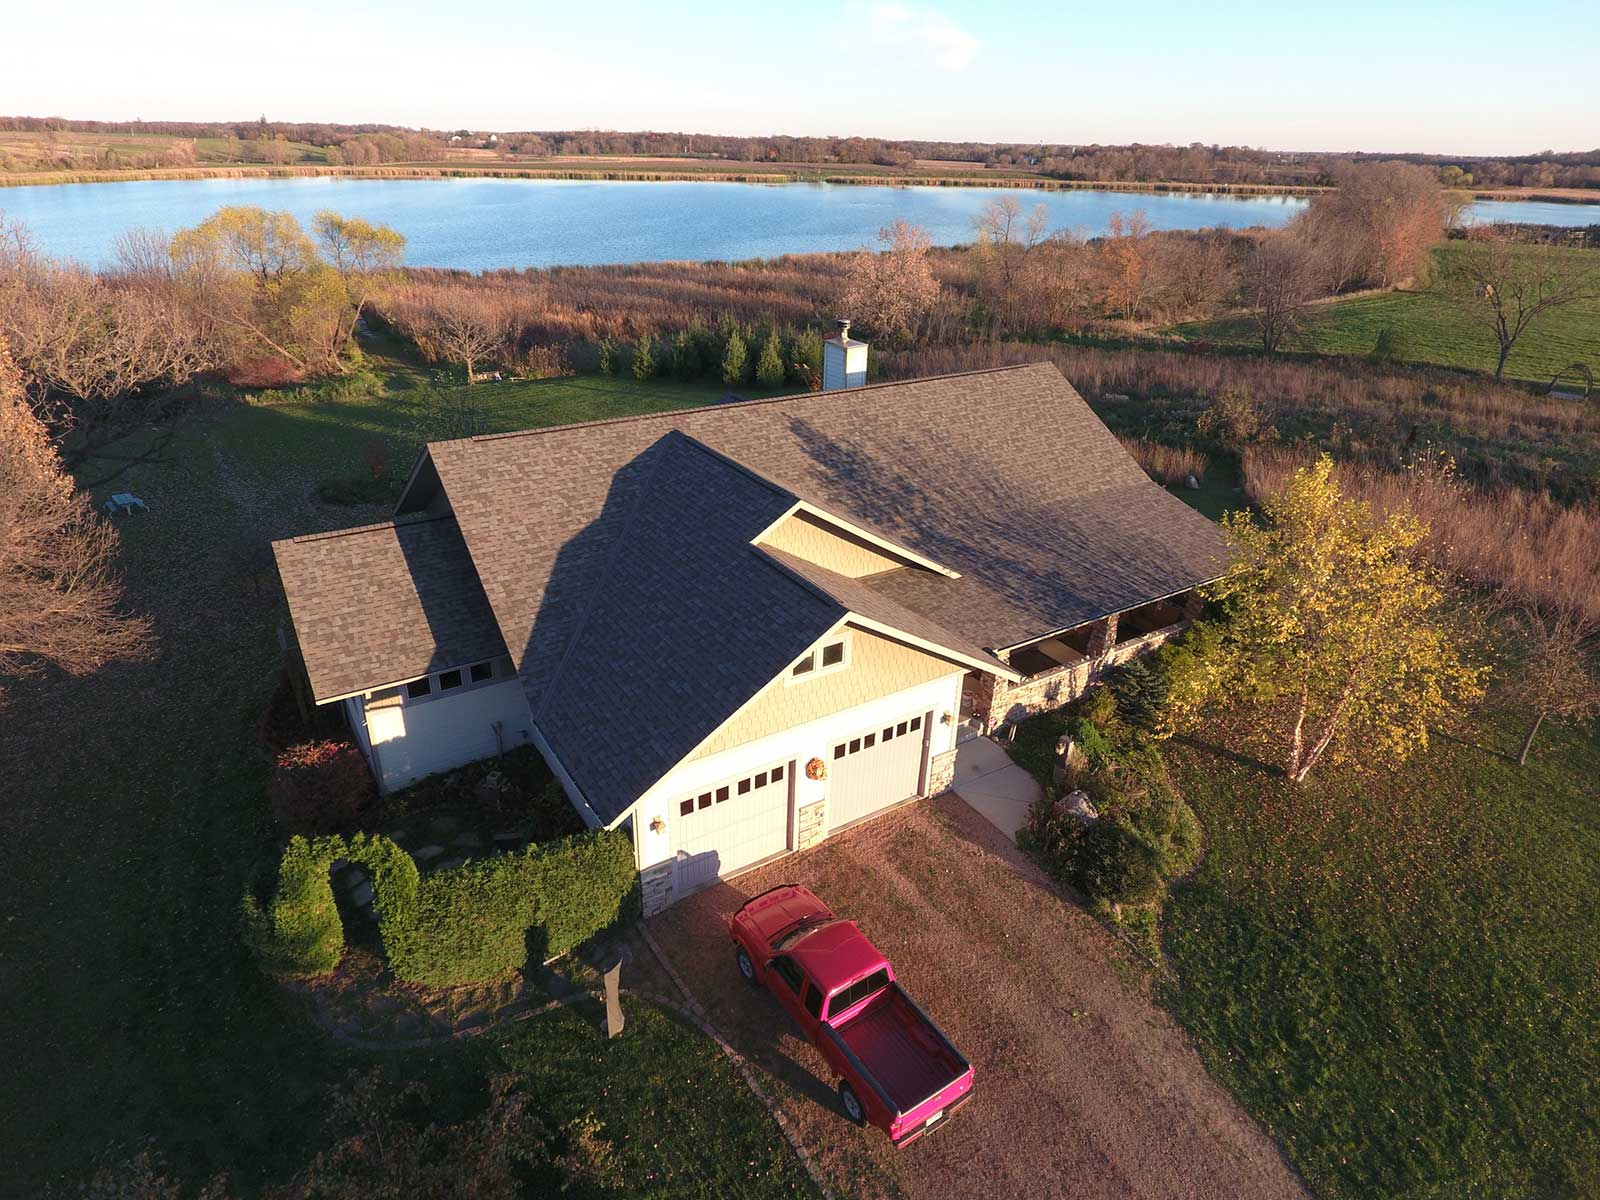 overhead photo of a house